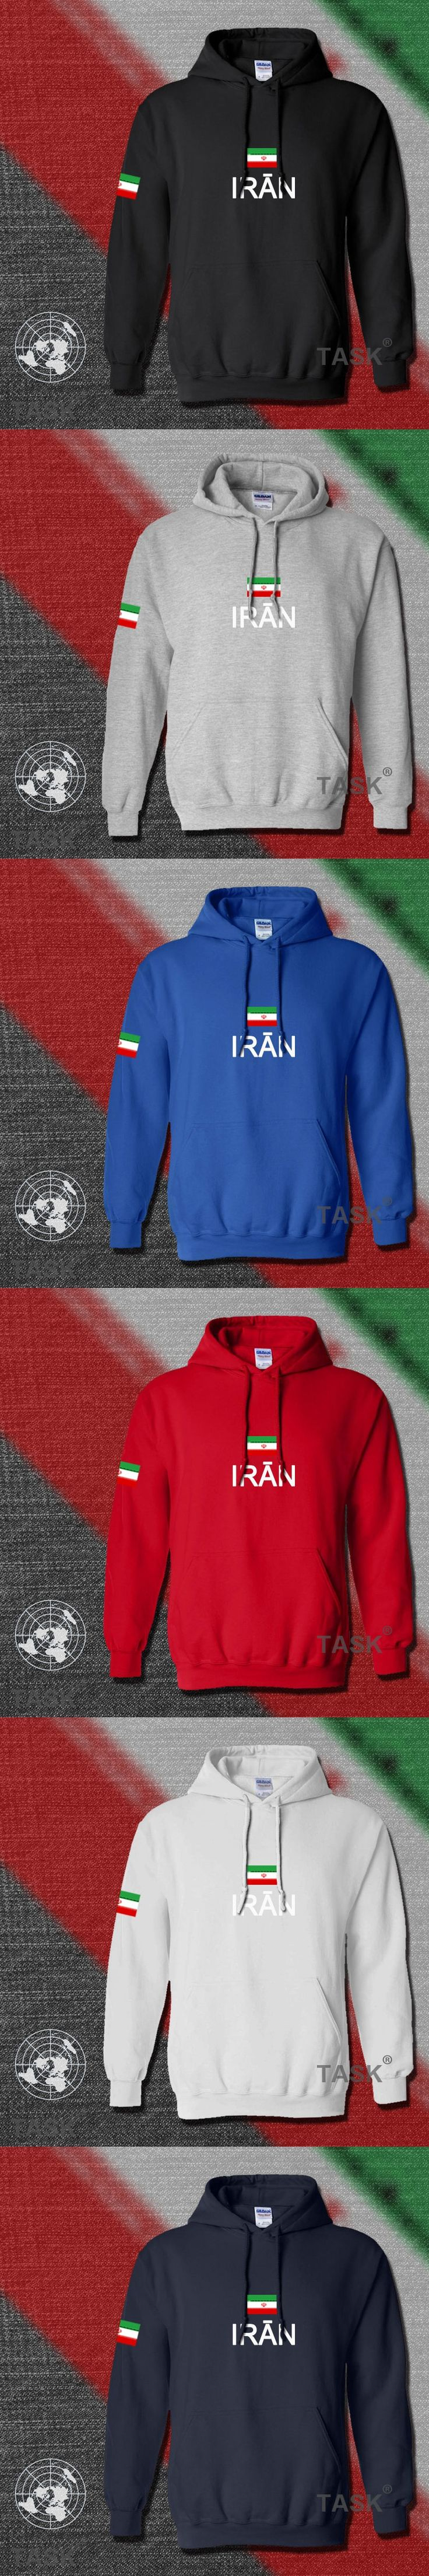 Islamic Republic of Iran Persia hoodies men sweatshirt polo sweat new hip hop streetwear jersey tracksuit nation flag fleece IR